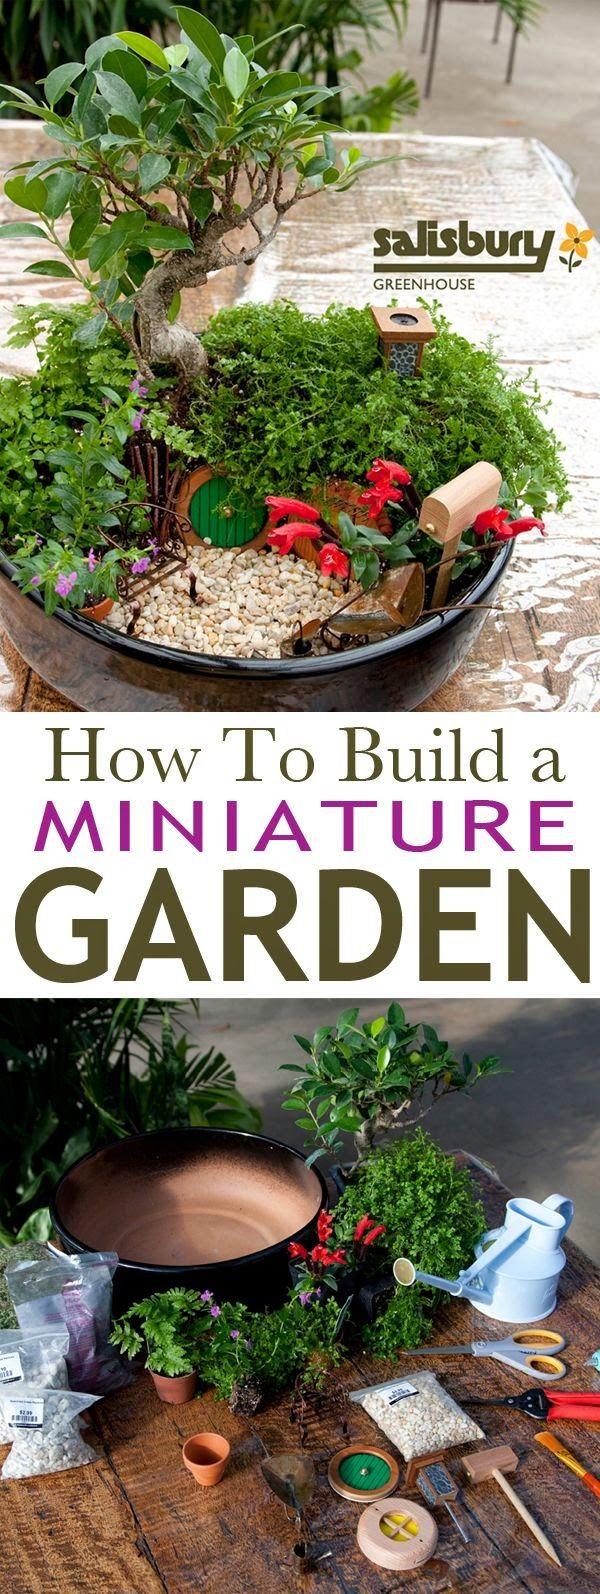 How To Build a #MiniatureGarden with Salisbury Greenhouse. #FairyGardening